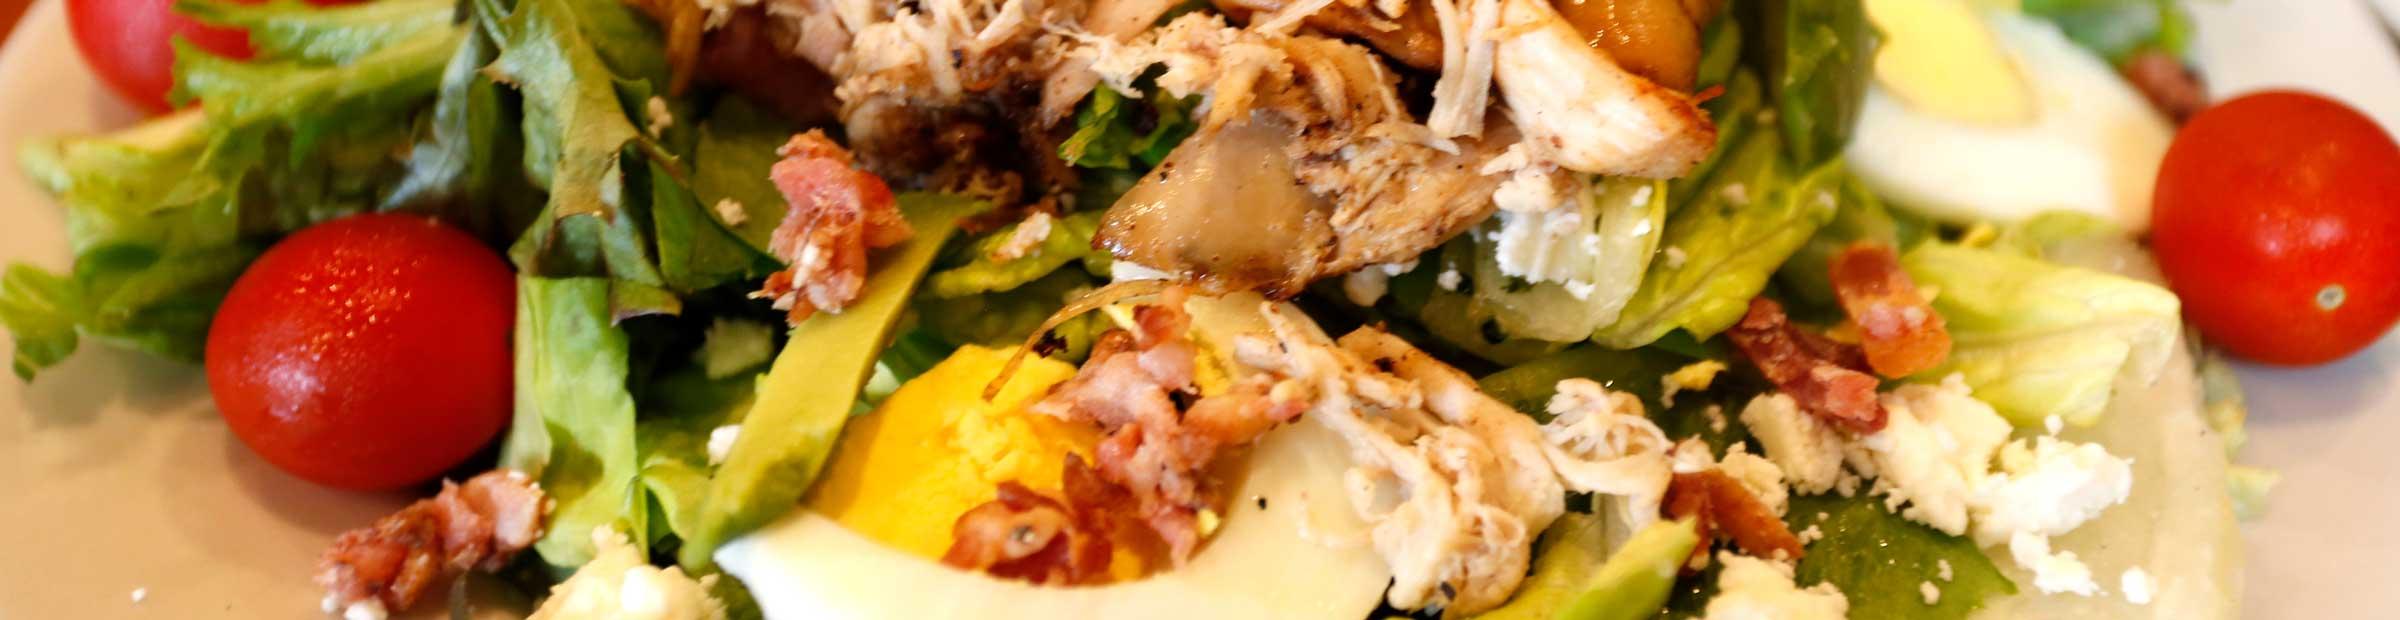 menu-sliver-salad